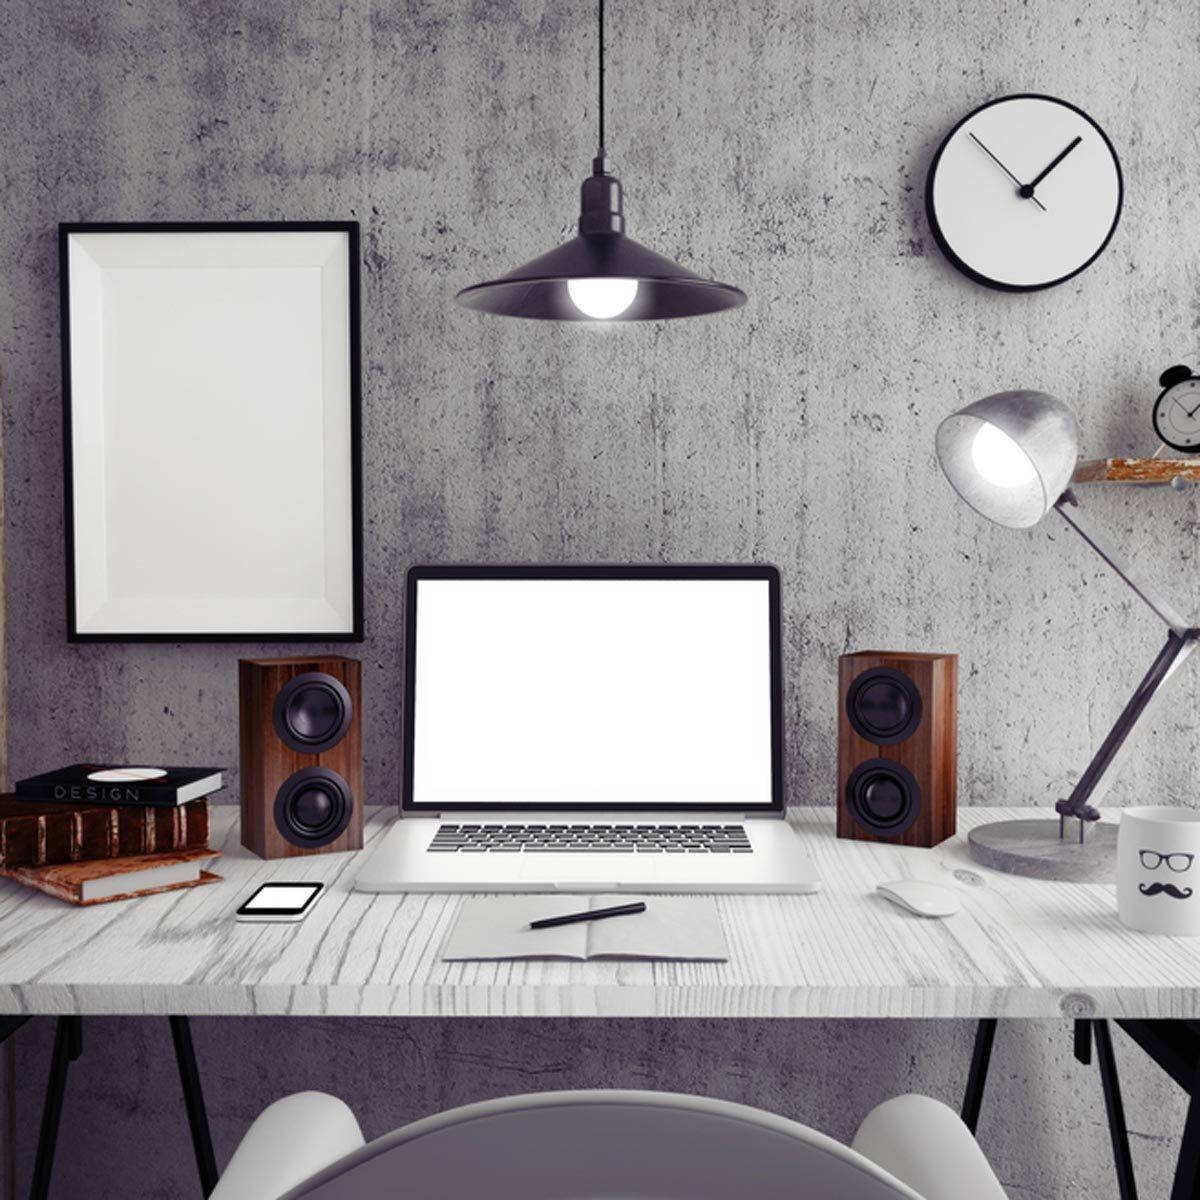 concrete basement office modern laptop computer speakers